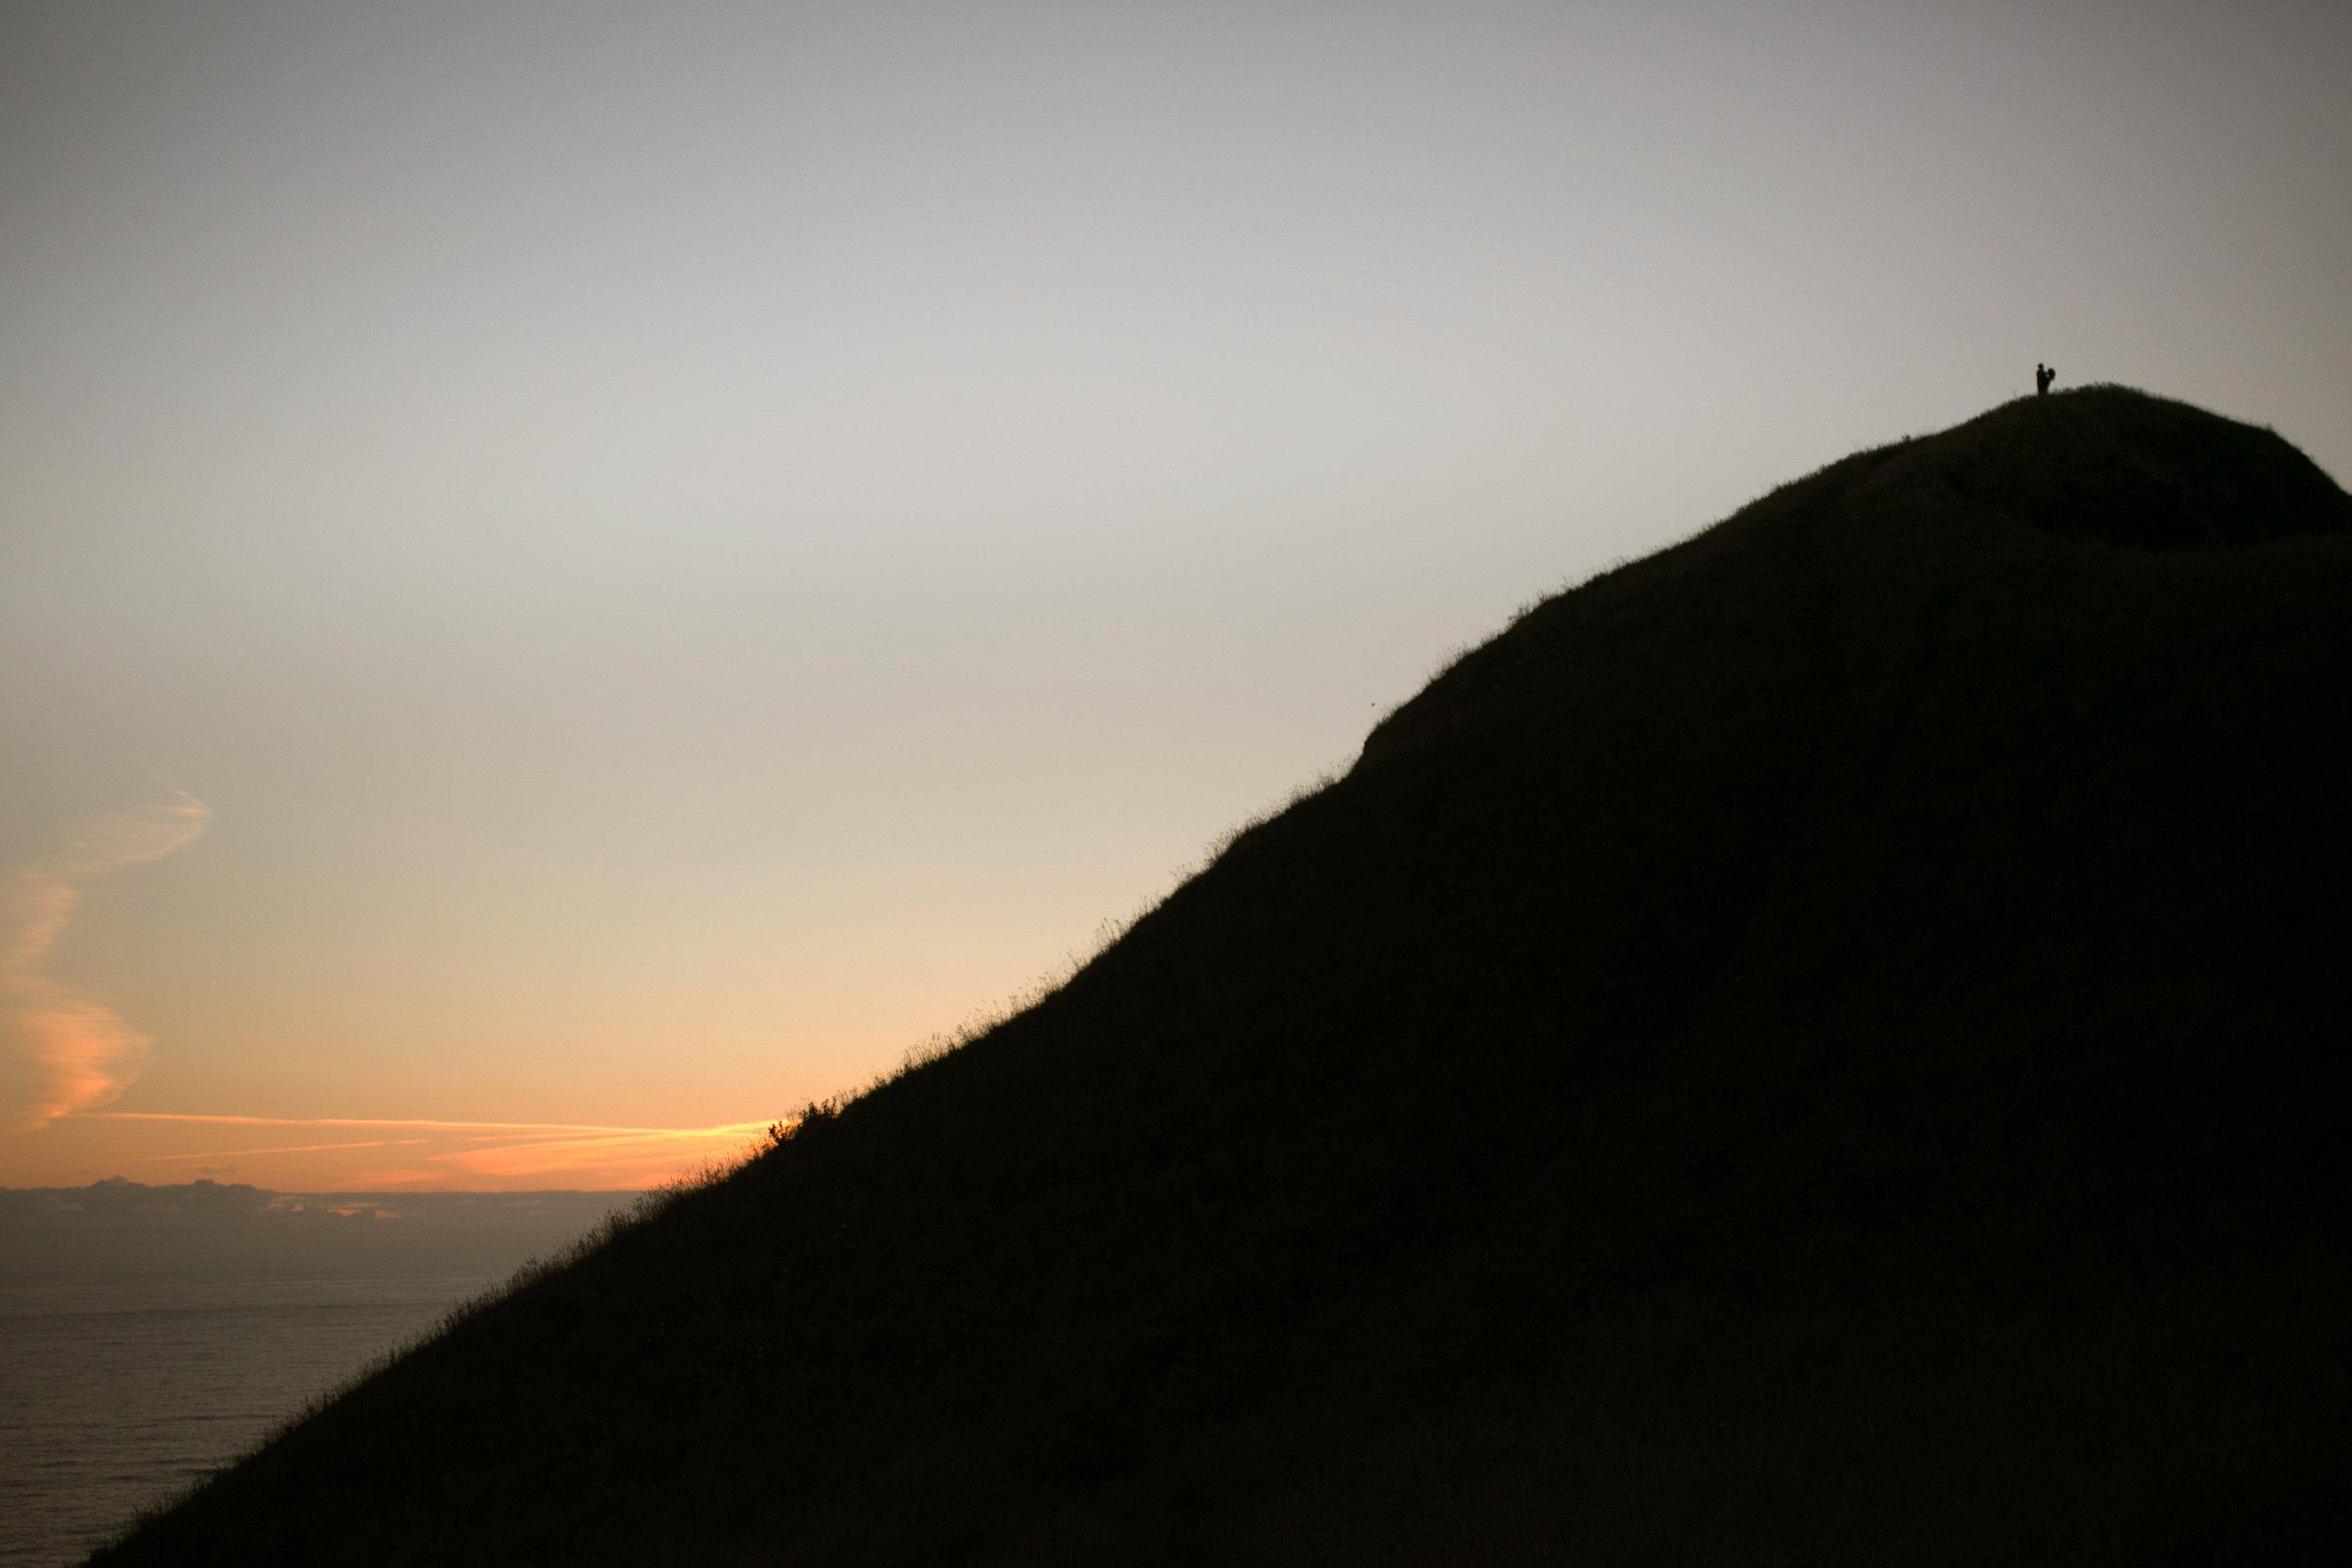 092Travel_Adventure_Outdoor_Photography_Outlive_Creative_Oregon_Coast_Gods_Thumb_sunset.jpg